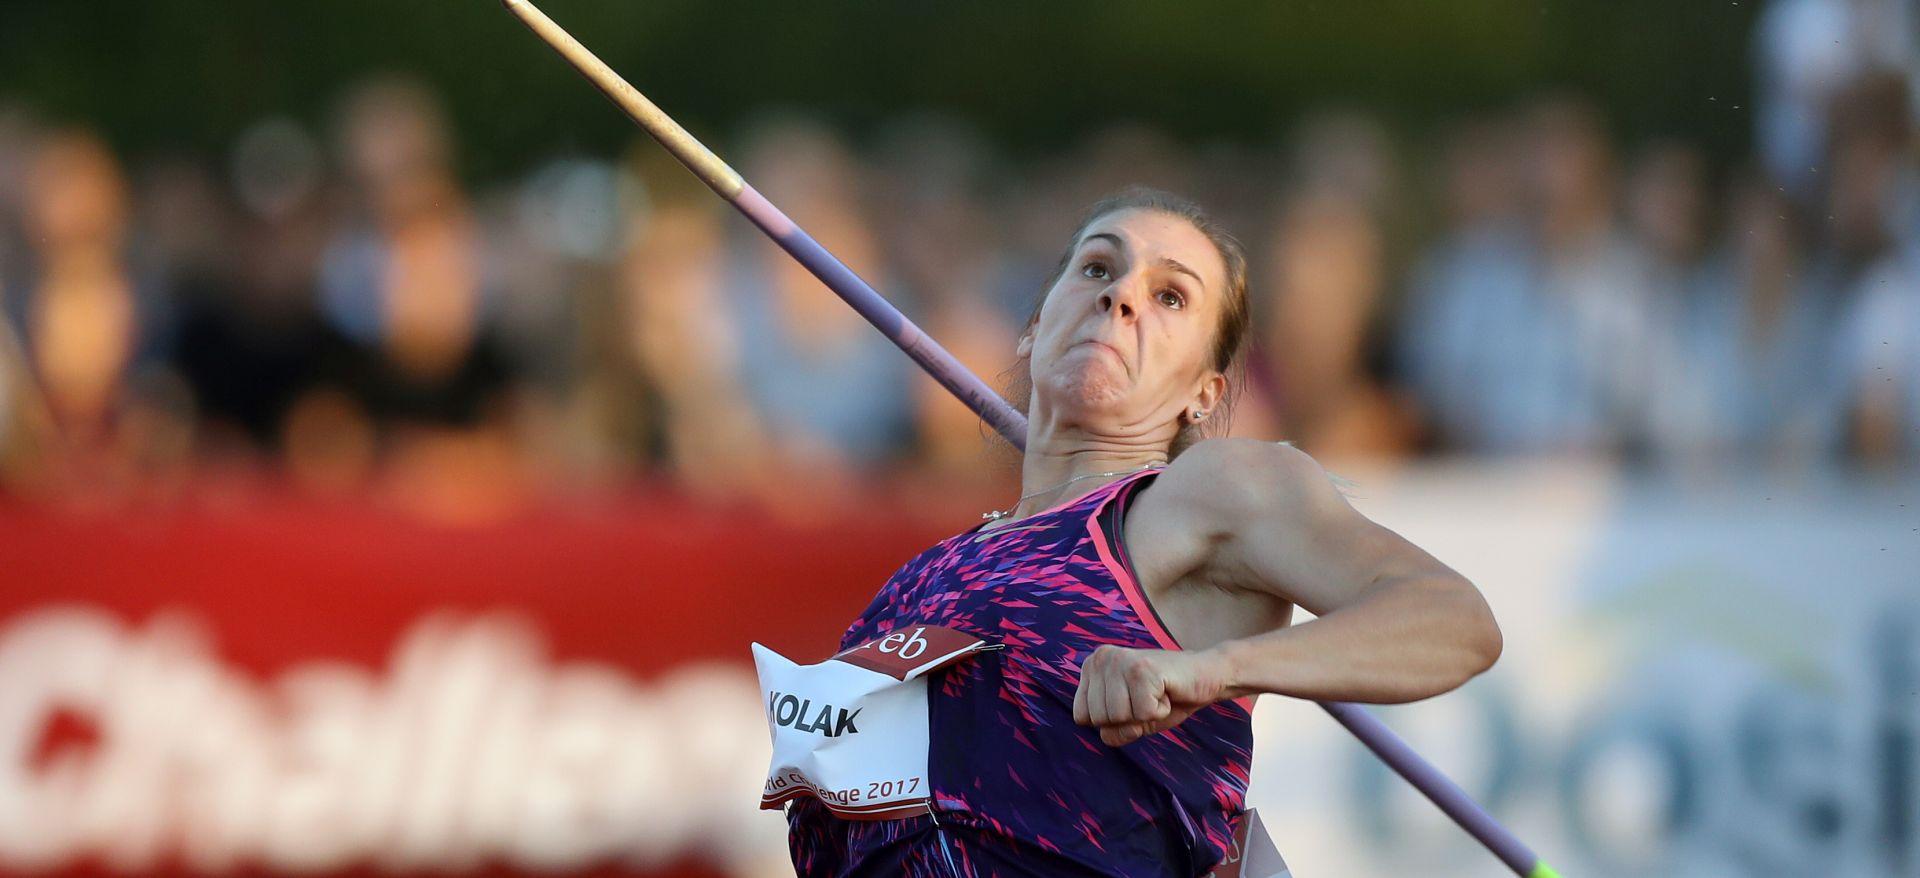 IAAF Raspored disciplina Dijamantne lige